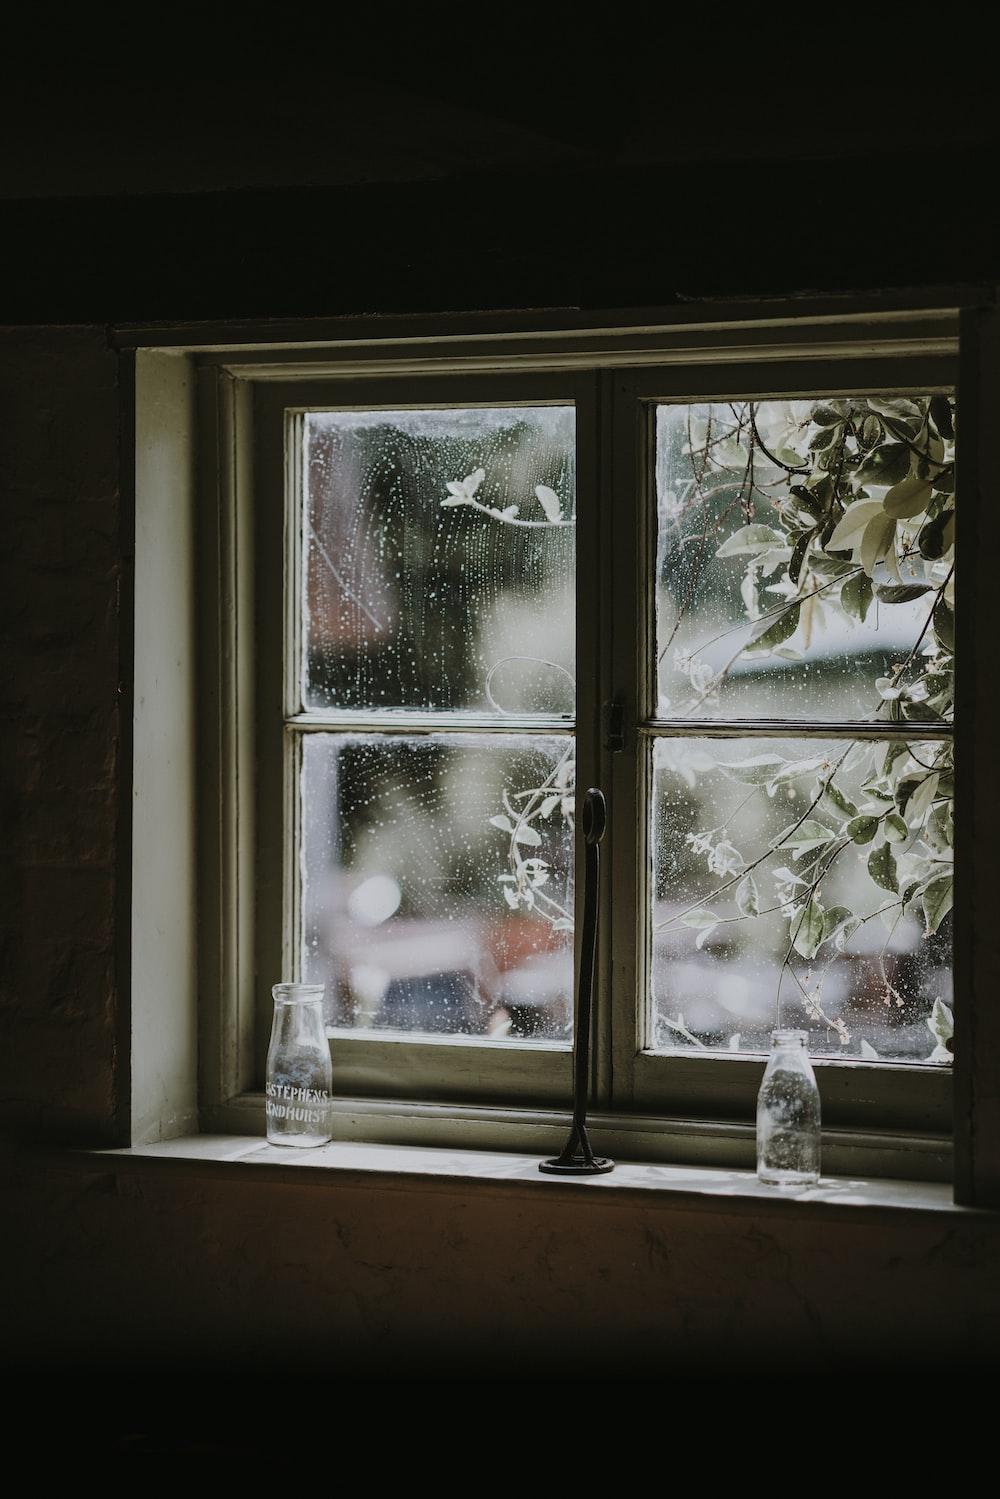 two milk glasses placed near window